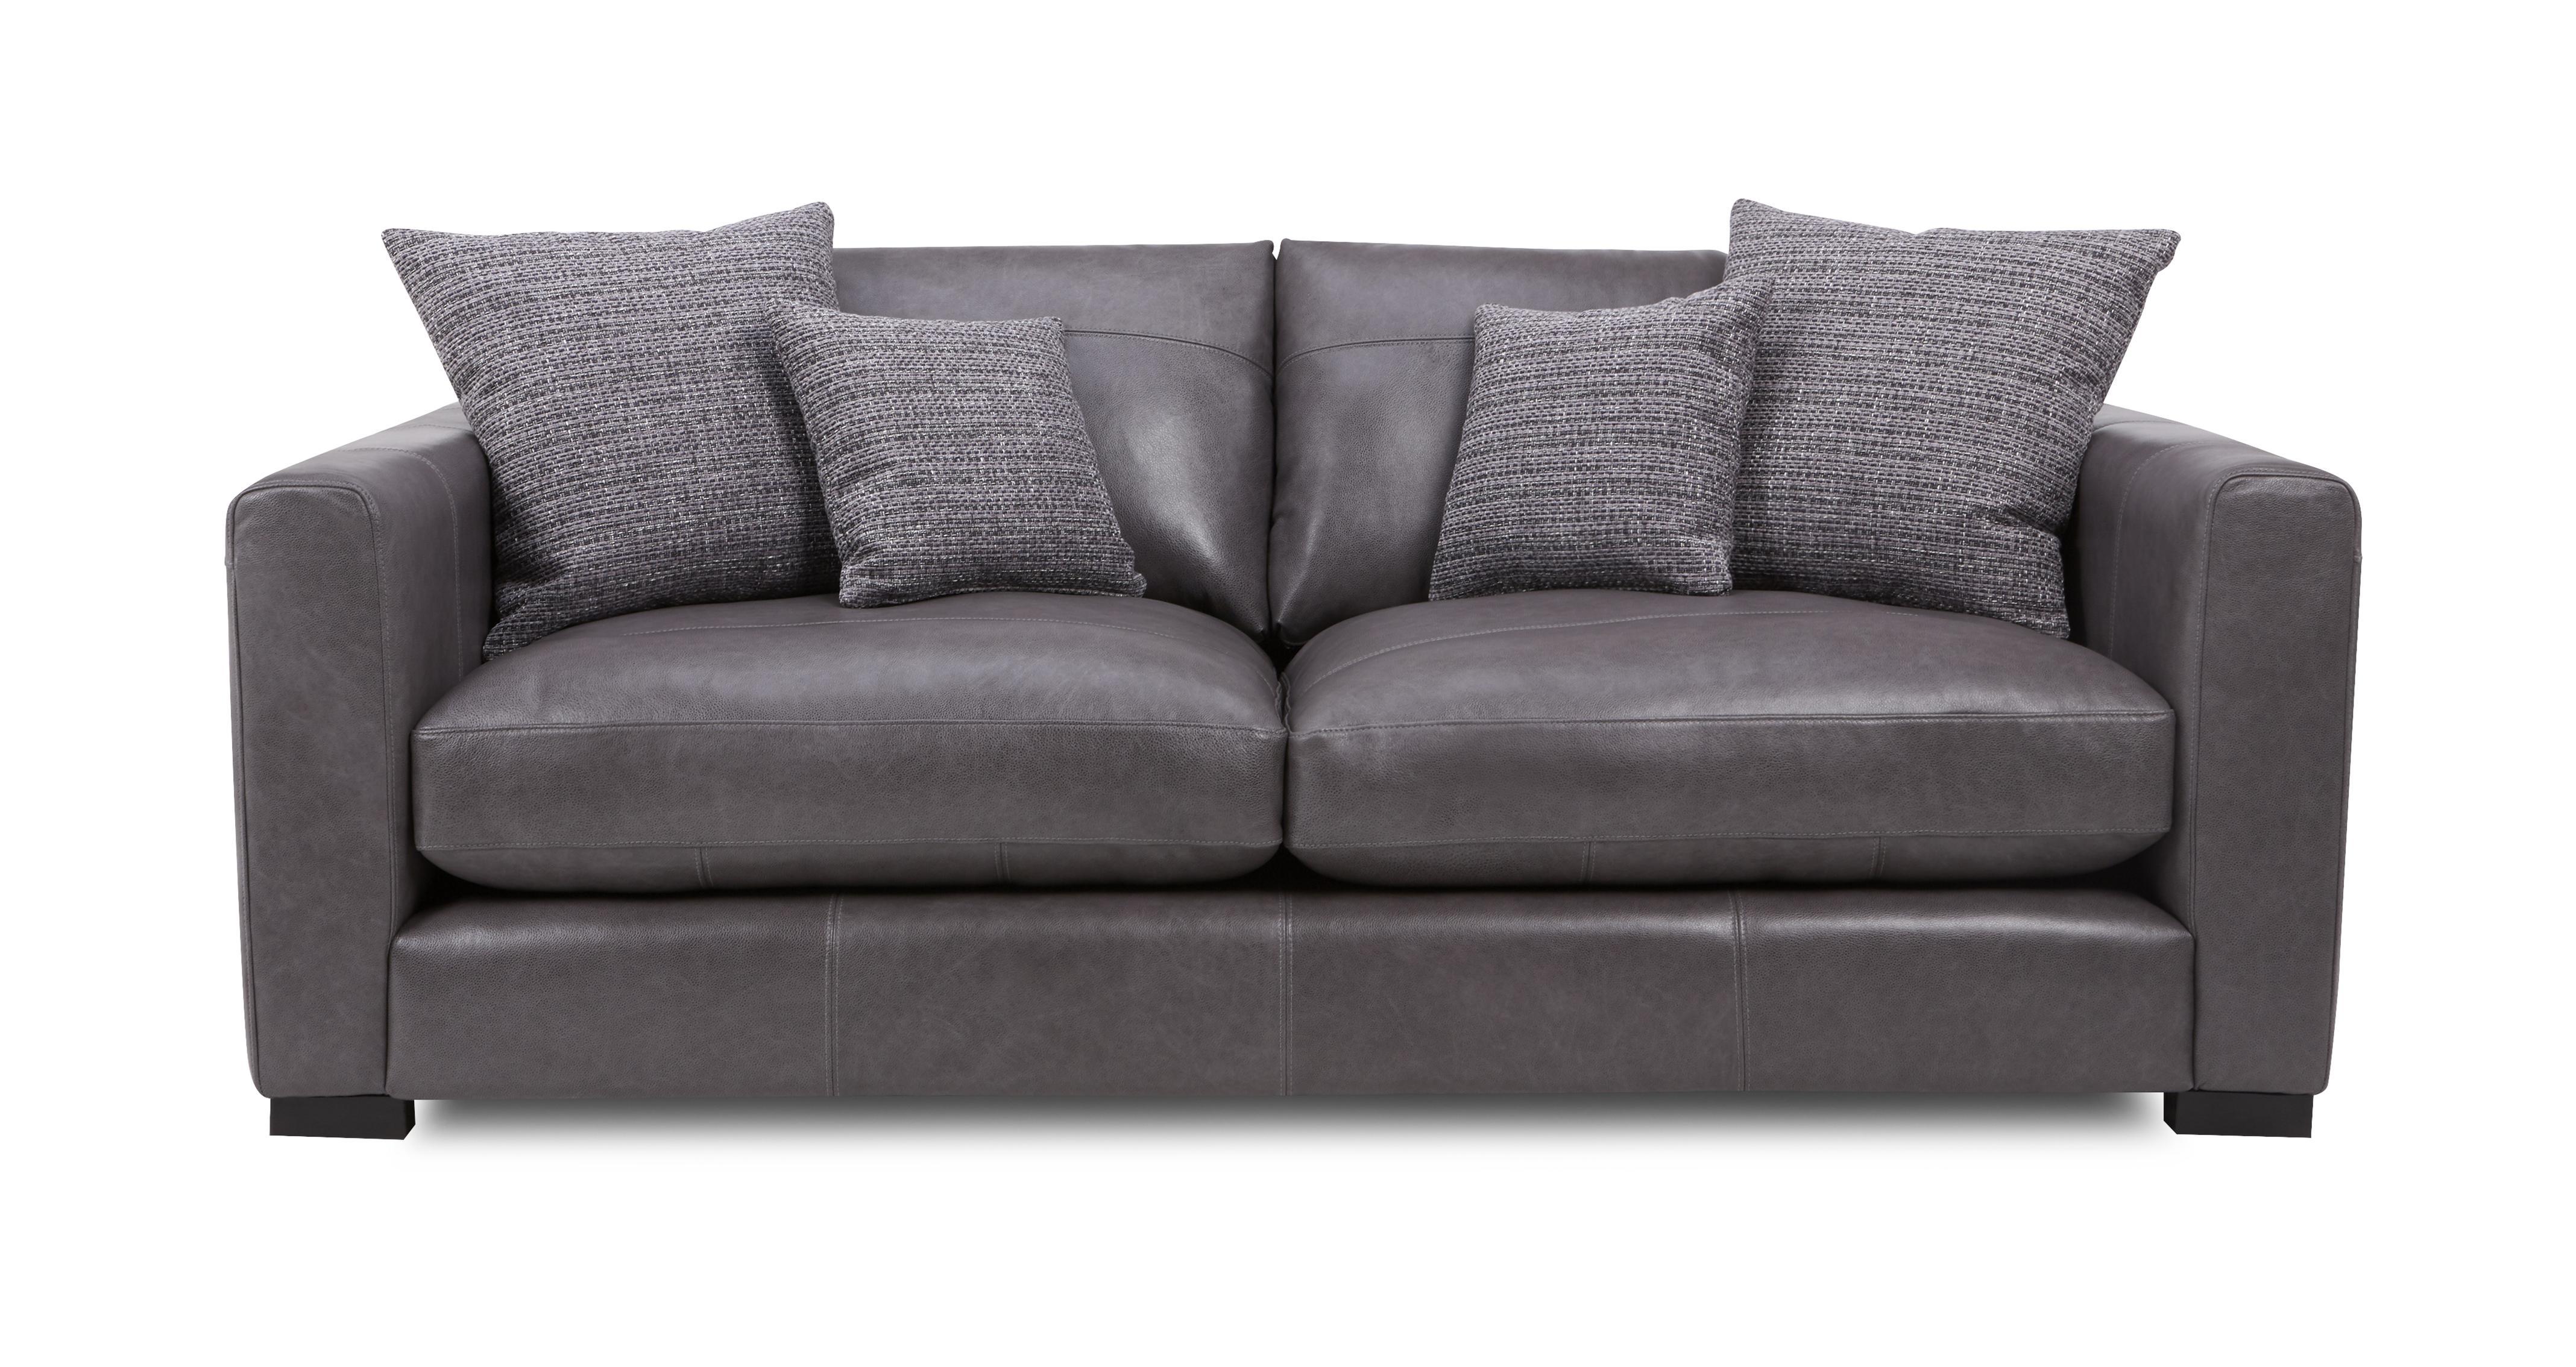 Dillon Leather Medium Sofa Dfs Ireland